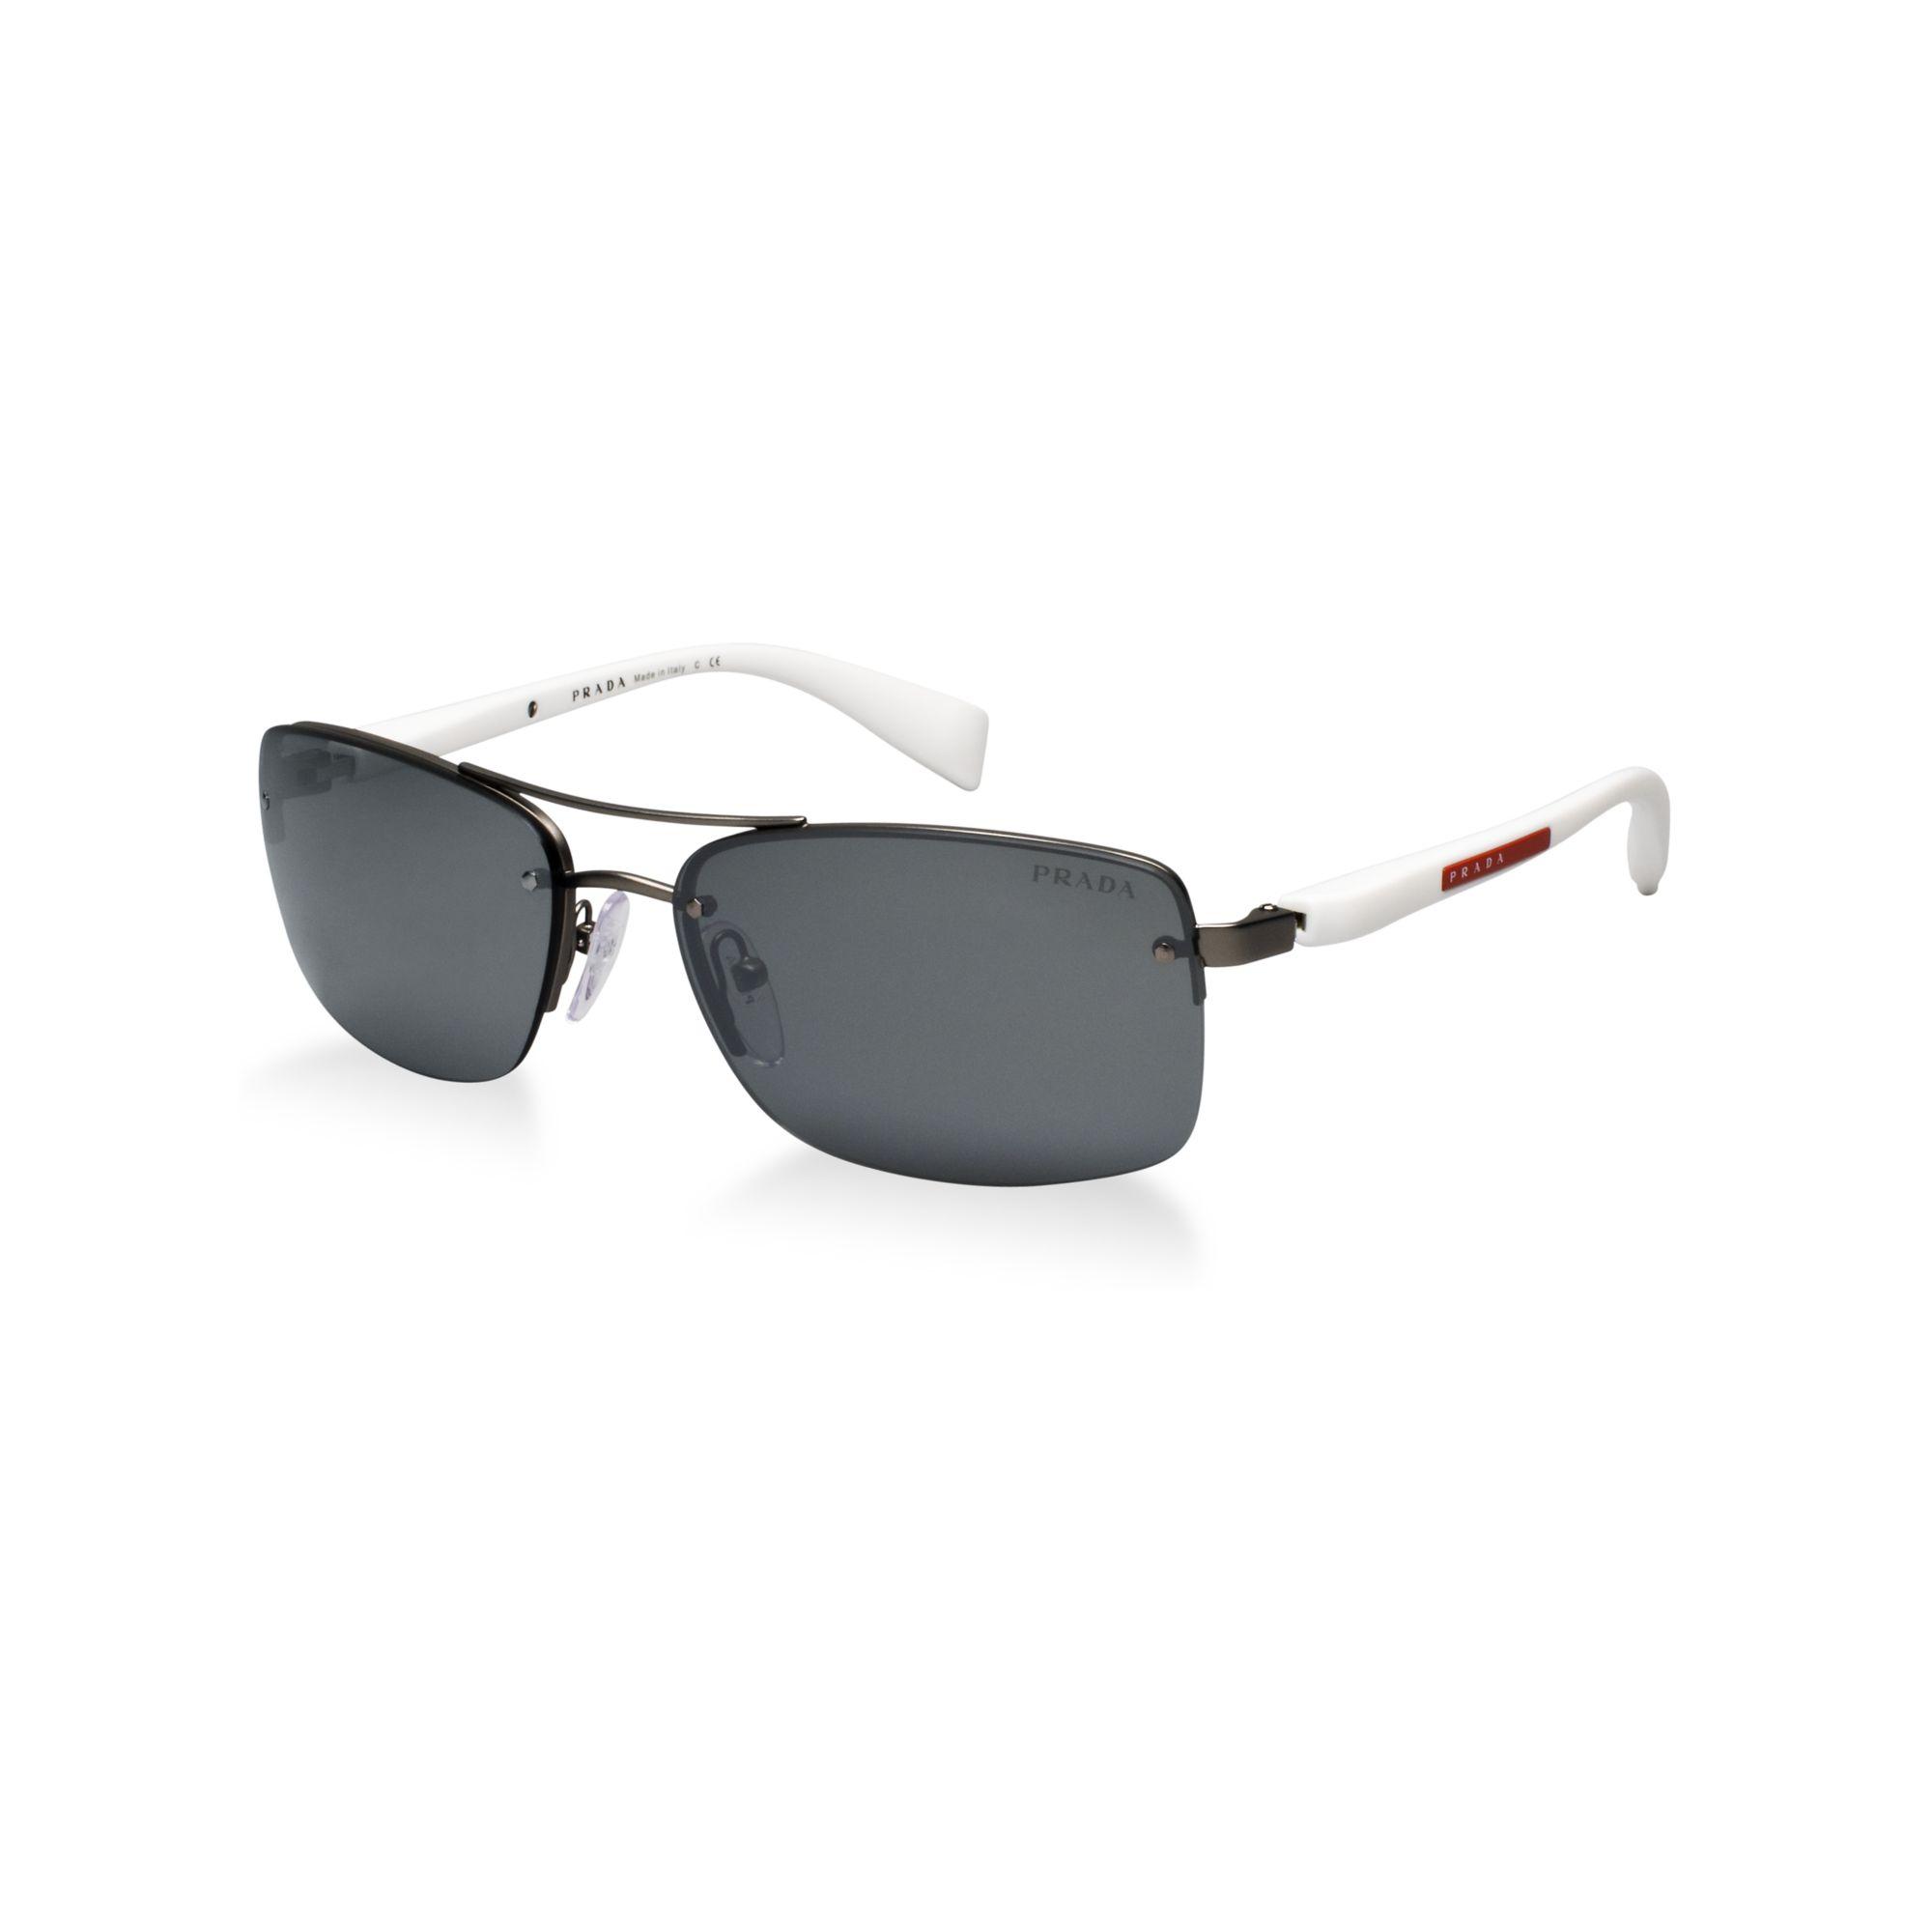 b8dccf2d7324b Lyst - Prada Prada Linea Rossa Sunglasses